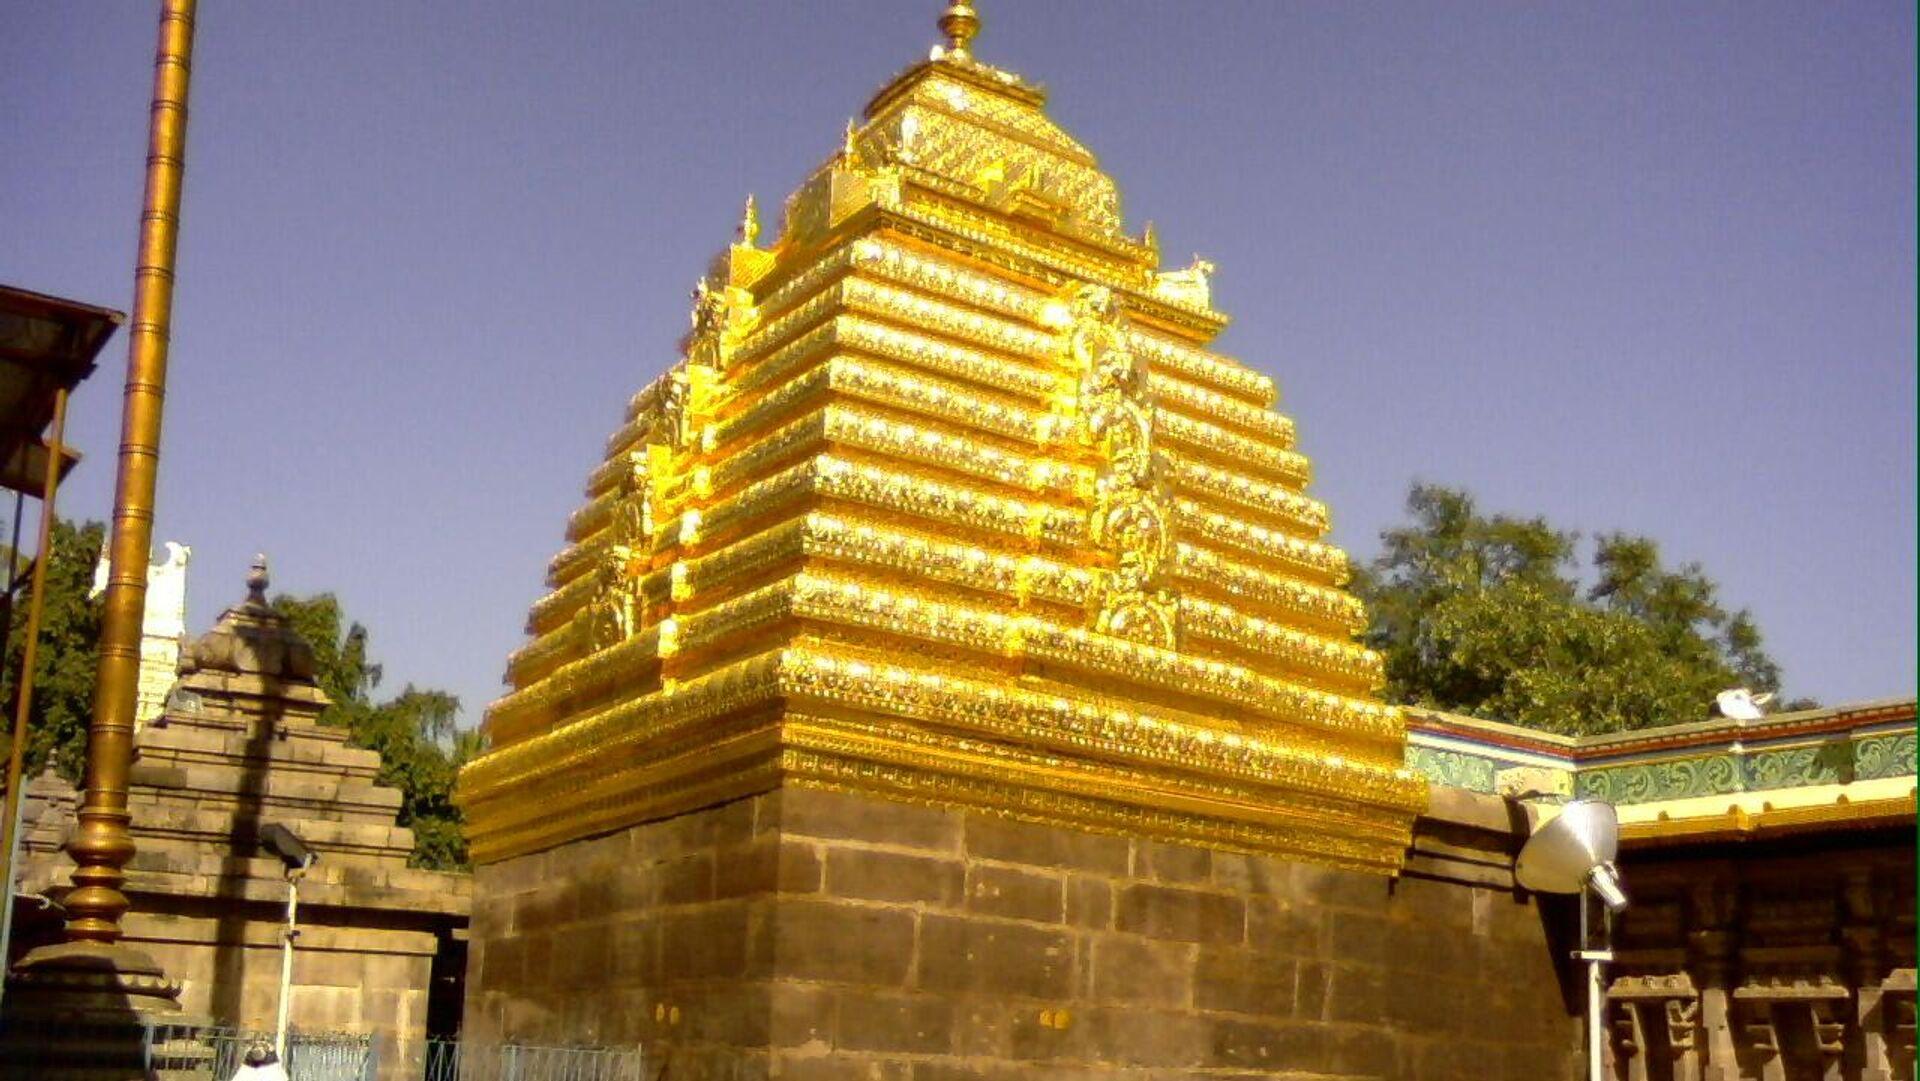 El templo Mallikarjun, Srisailam, La India - Sputnik Mundo, 1920, 17.06.2021